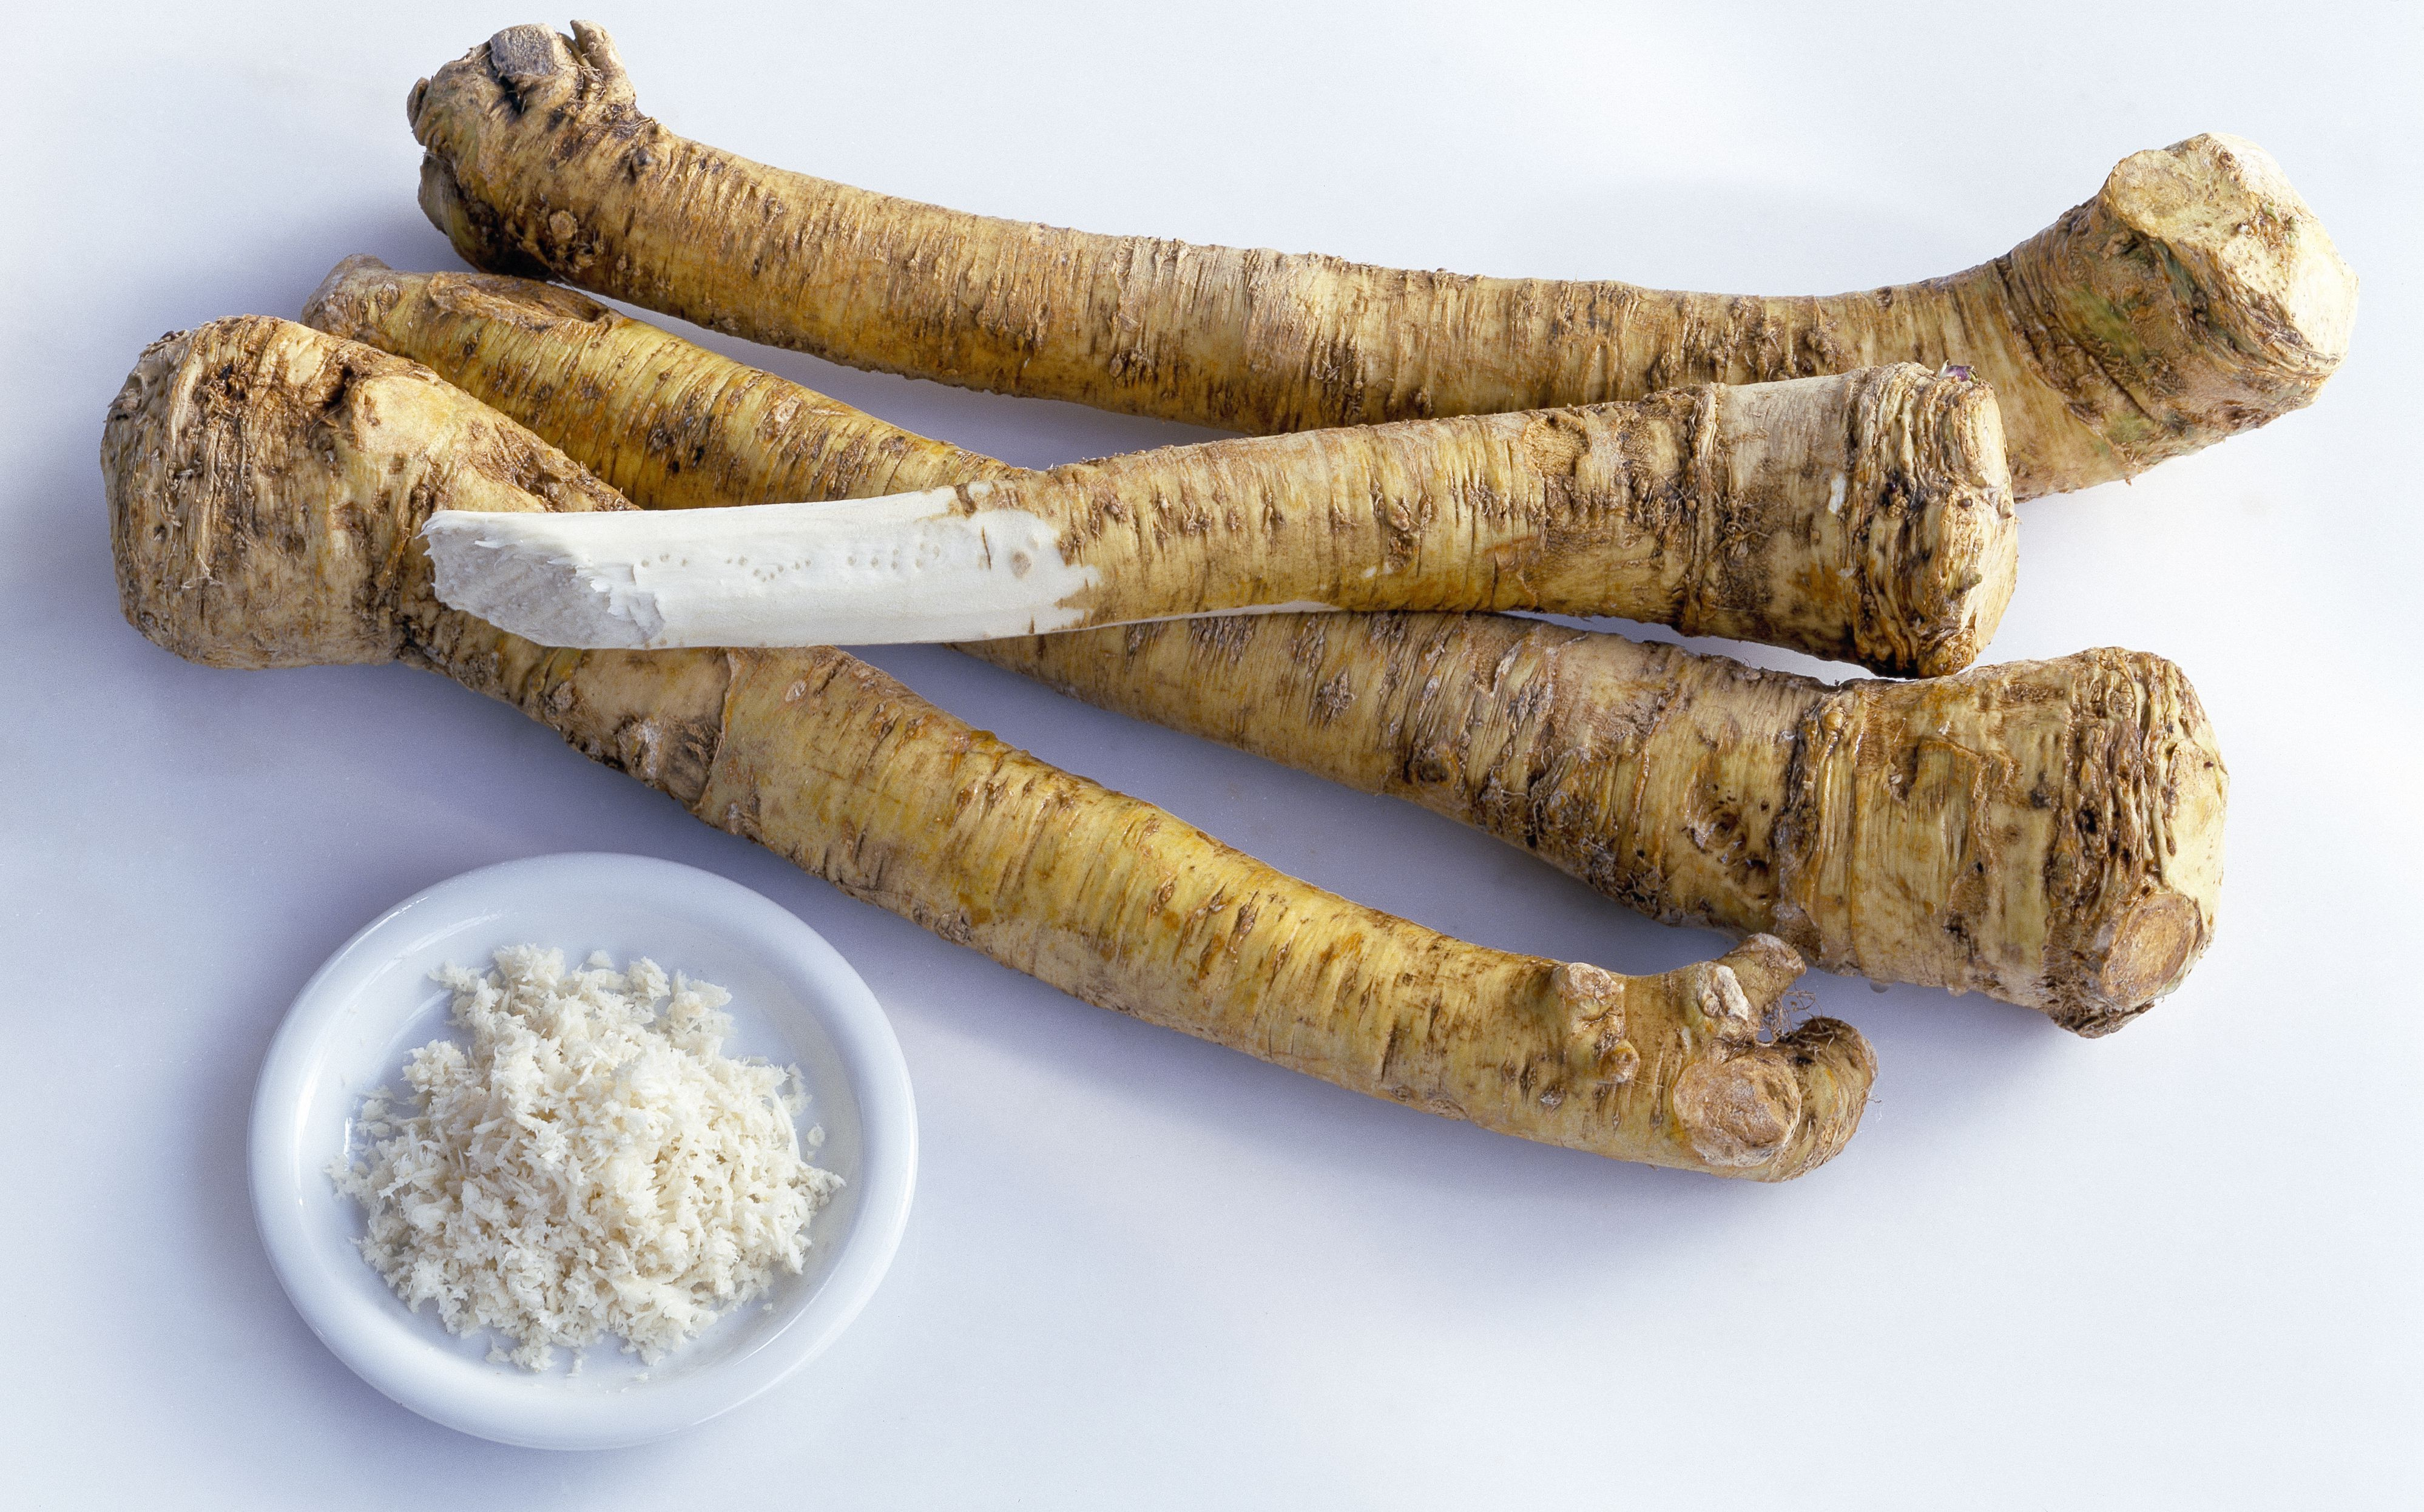 Four sticks of horseradish and bowl of grated horseradish